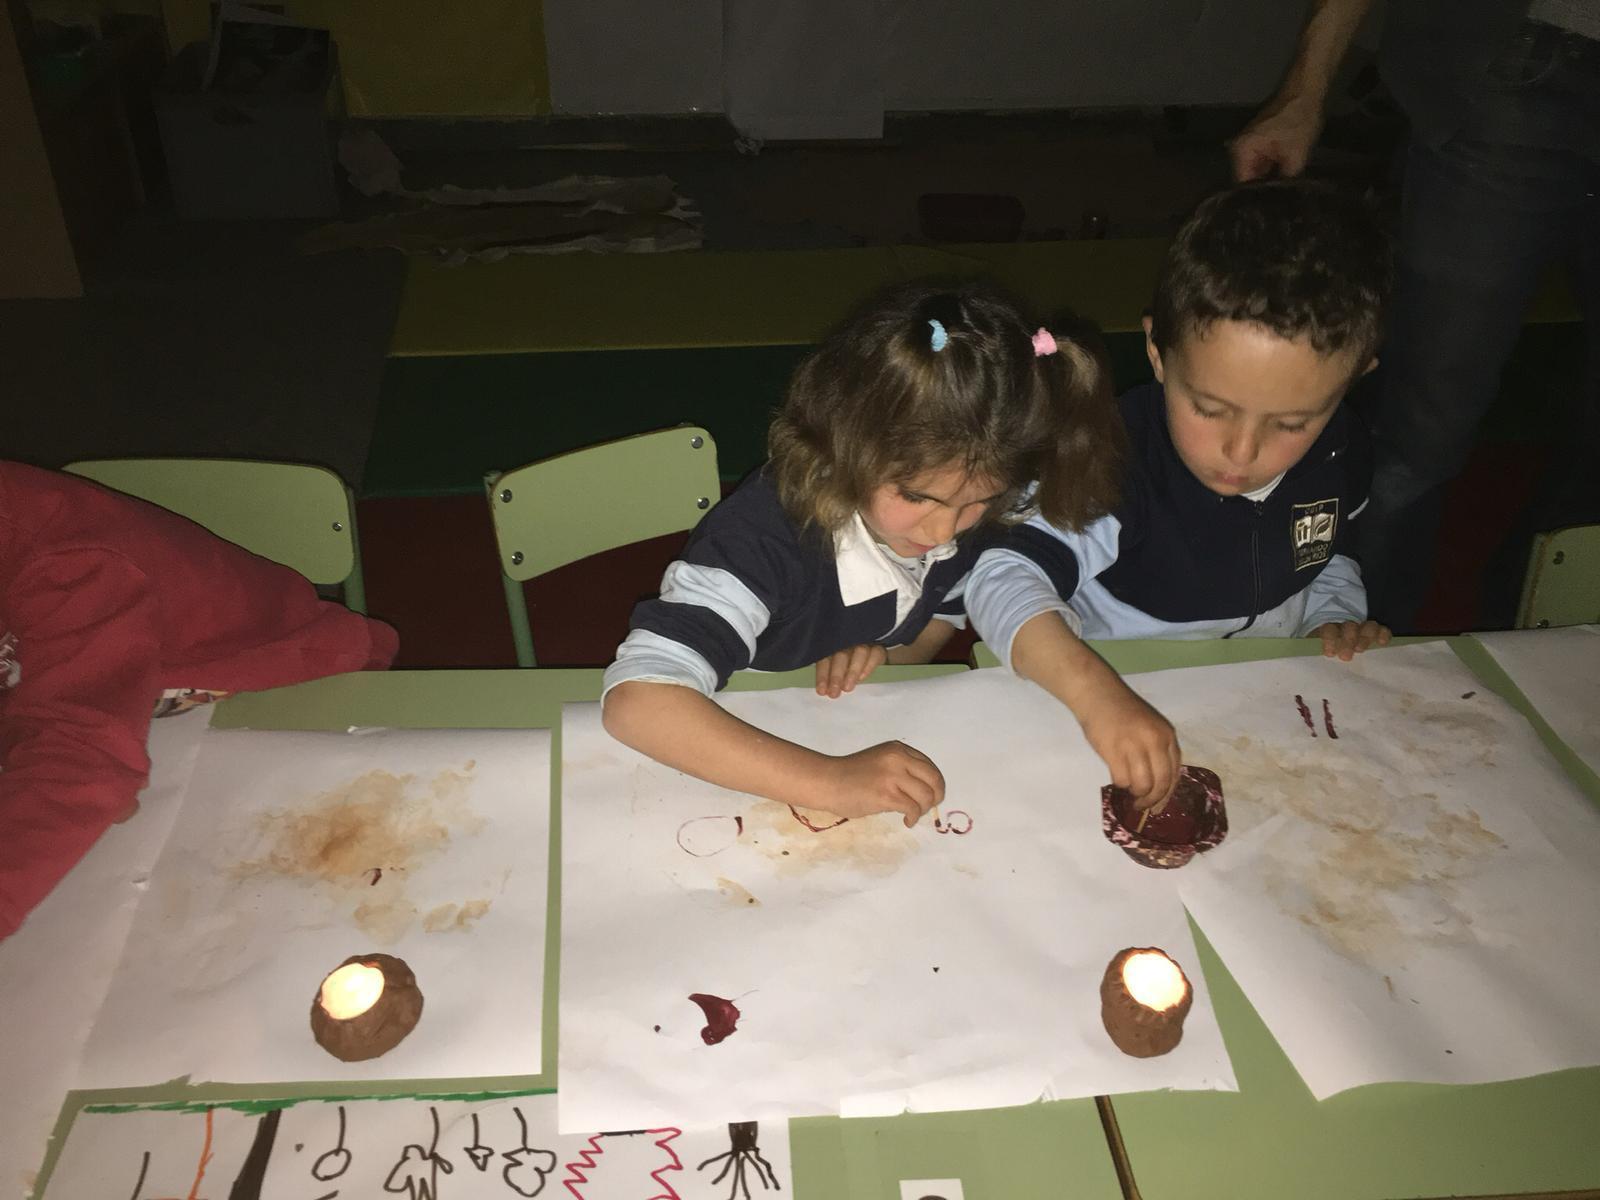 2019_03_15_Infantil 4B descubre la pintura rupestre_CEIP FDLR_Las Rozas 2